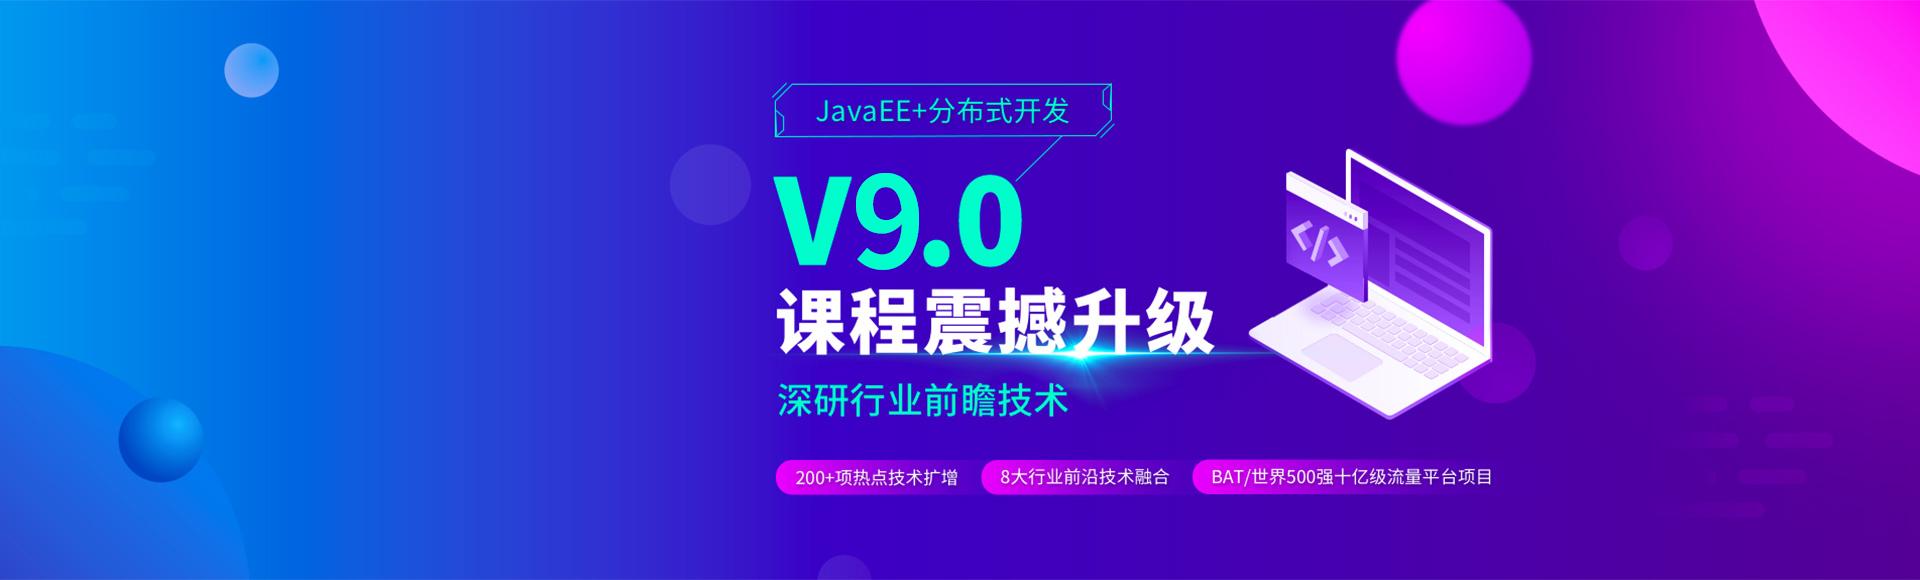 JavaEE+分布式開發課程震撼升級